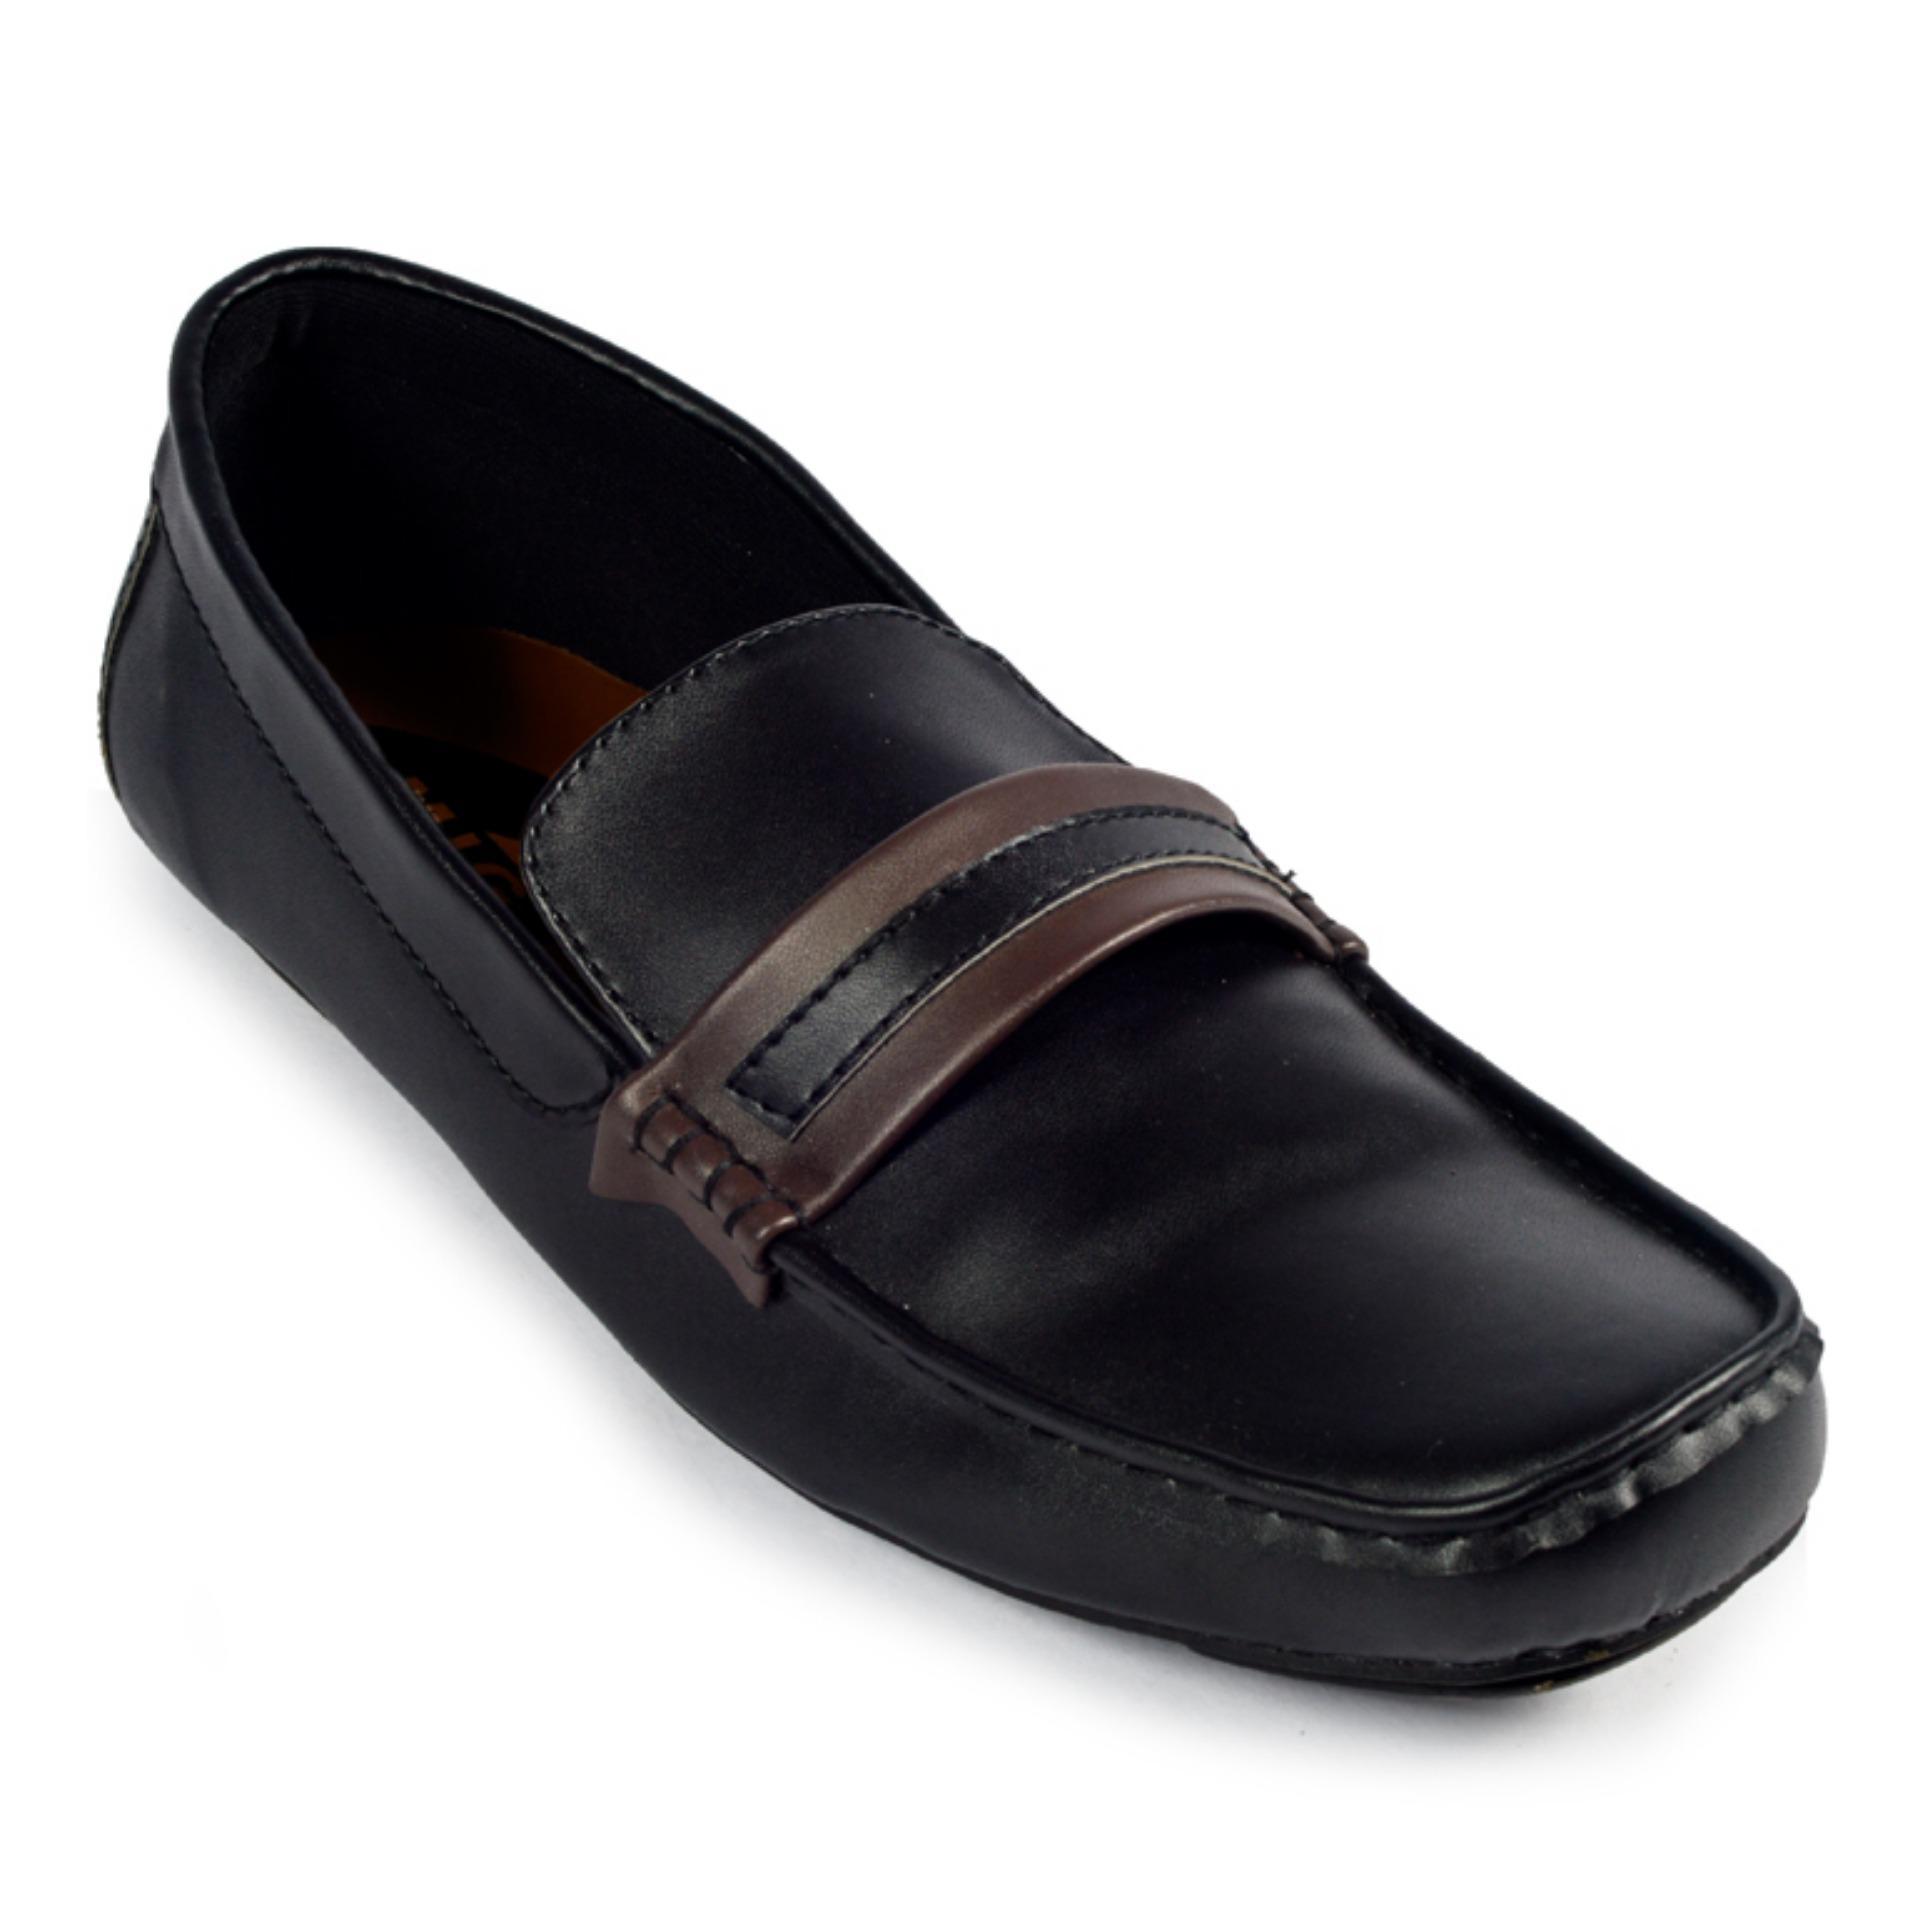 Penawaran Bagus Sepatu Lazada Pria Slip on Trumph Eagle Moccasin ... 36ec01fb2d